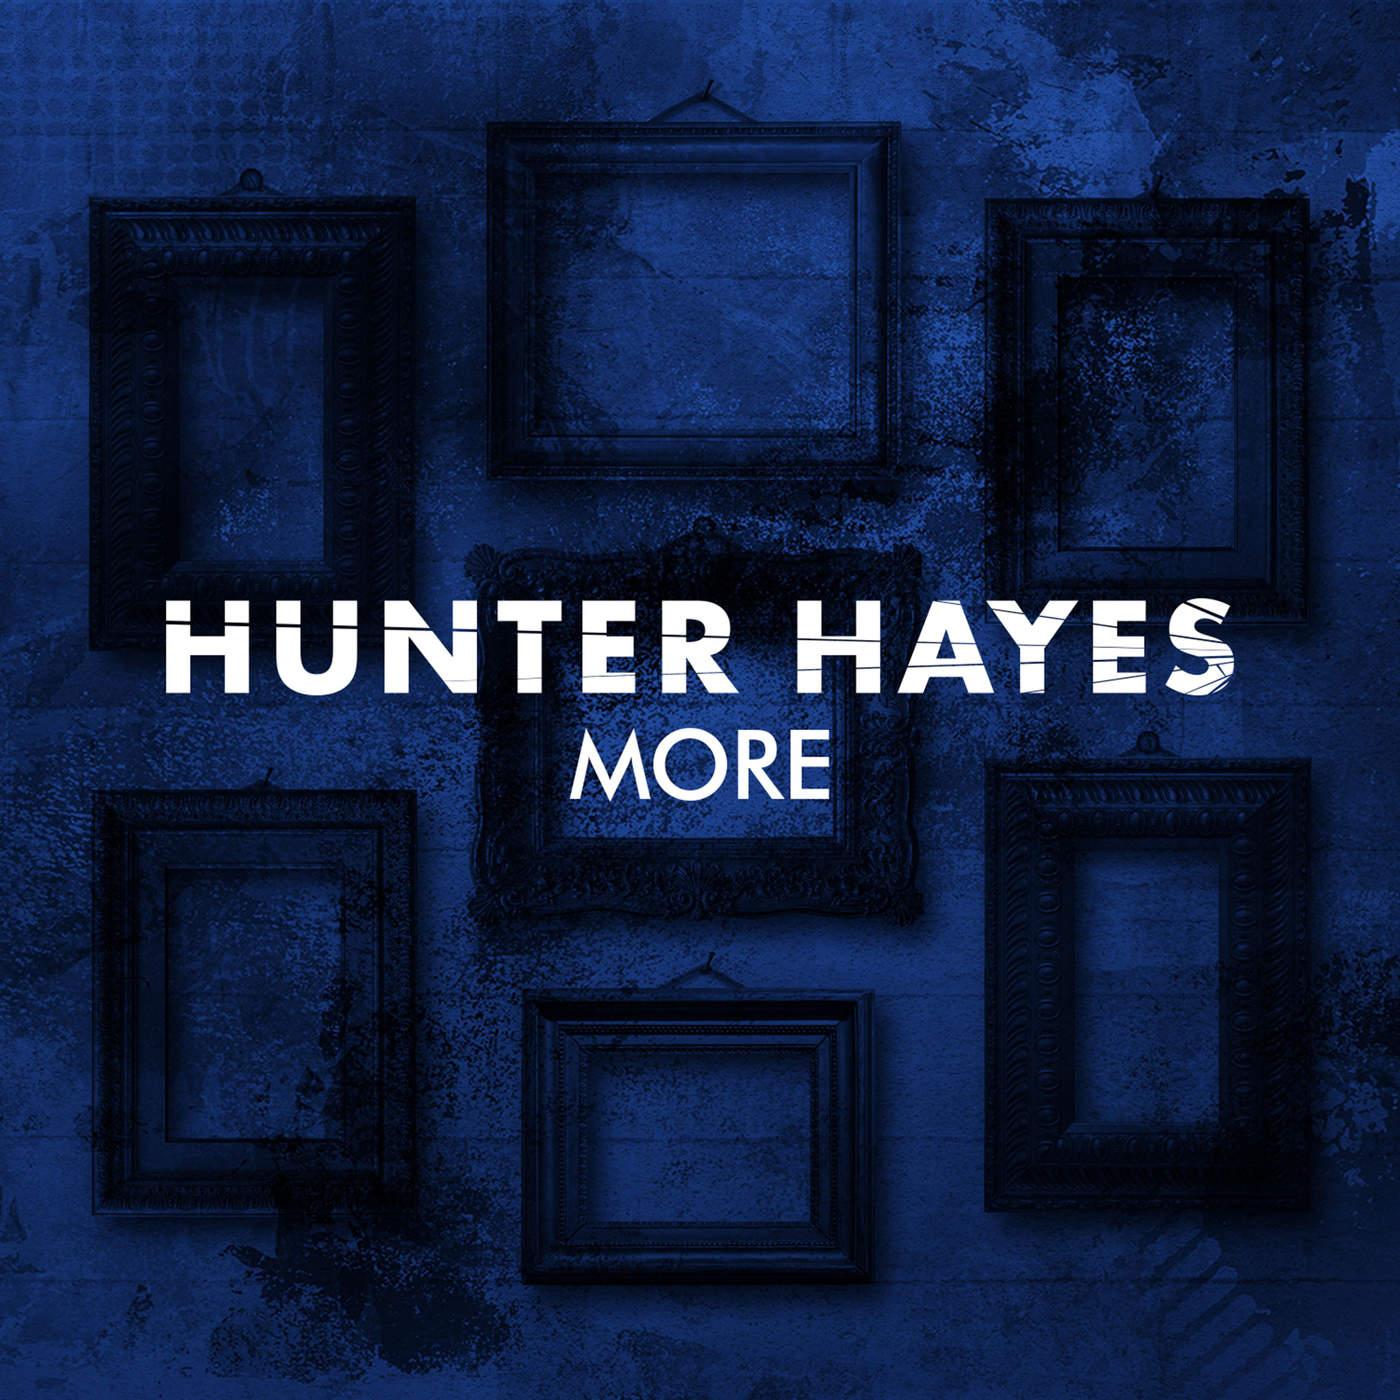 Hunter Hayes - More - Single